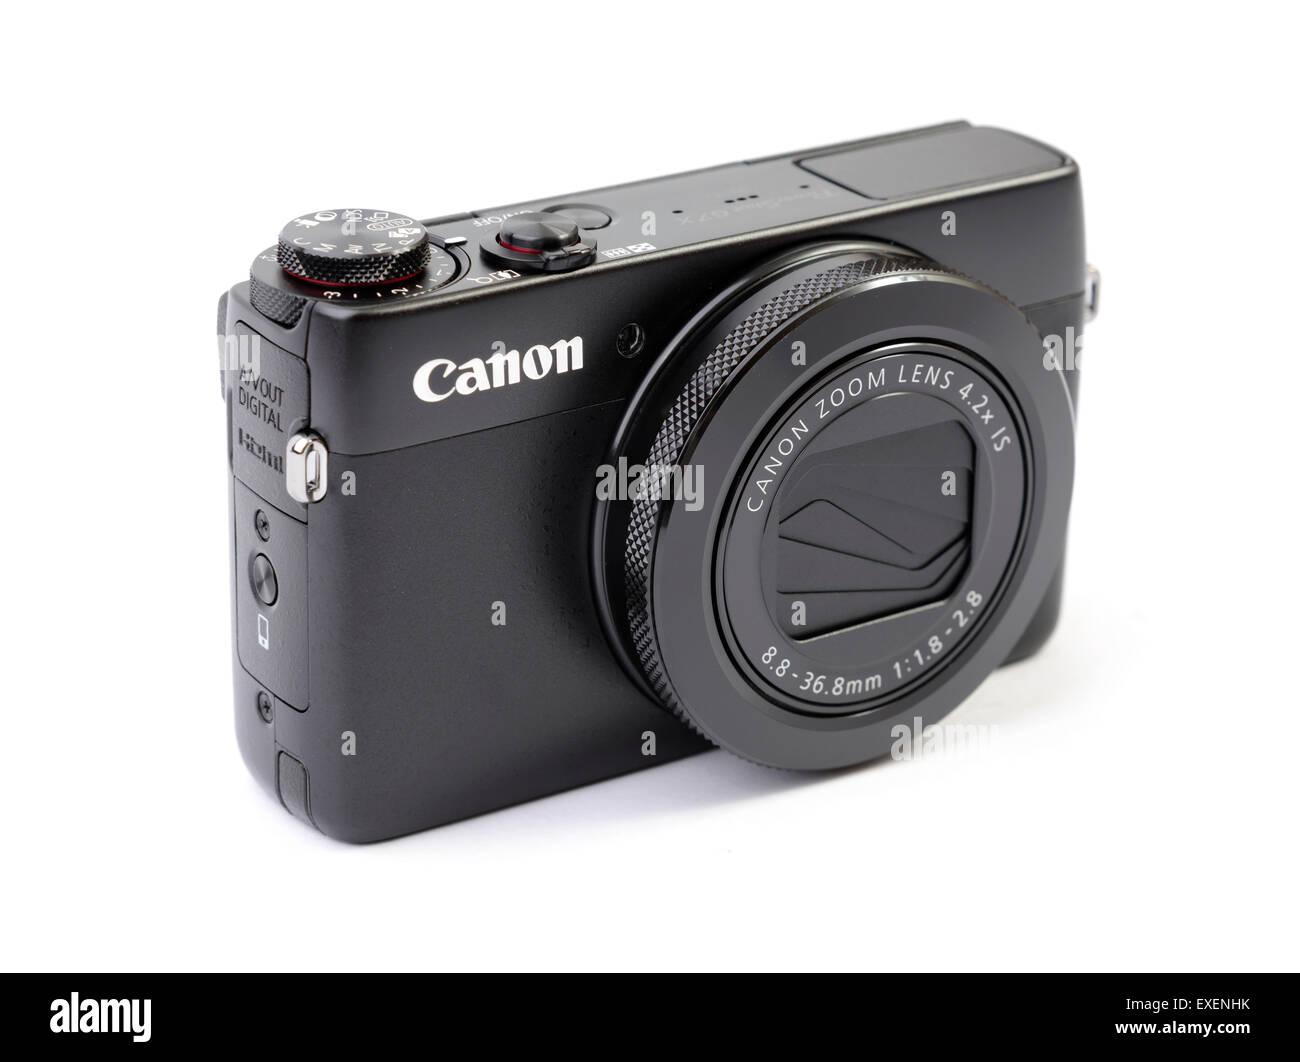 Canon PowerShot G7X compact digital camera isolated on white background - Stock Image